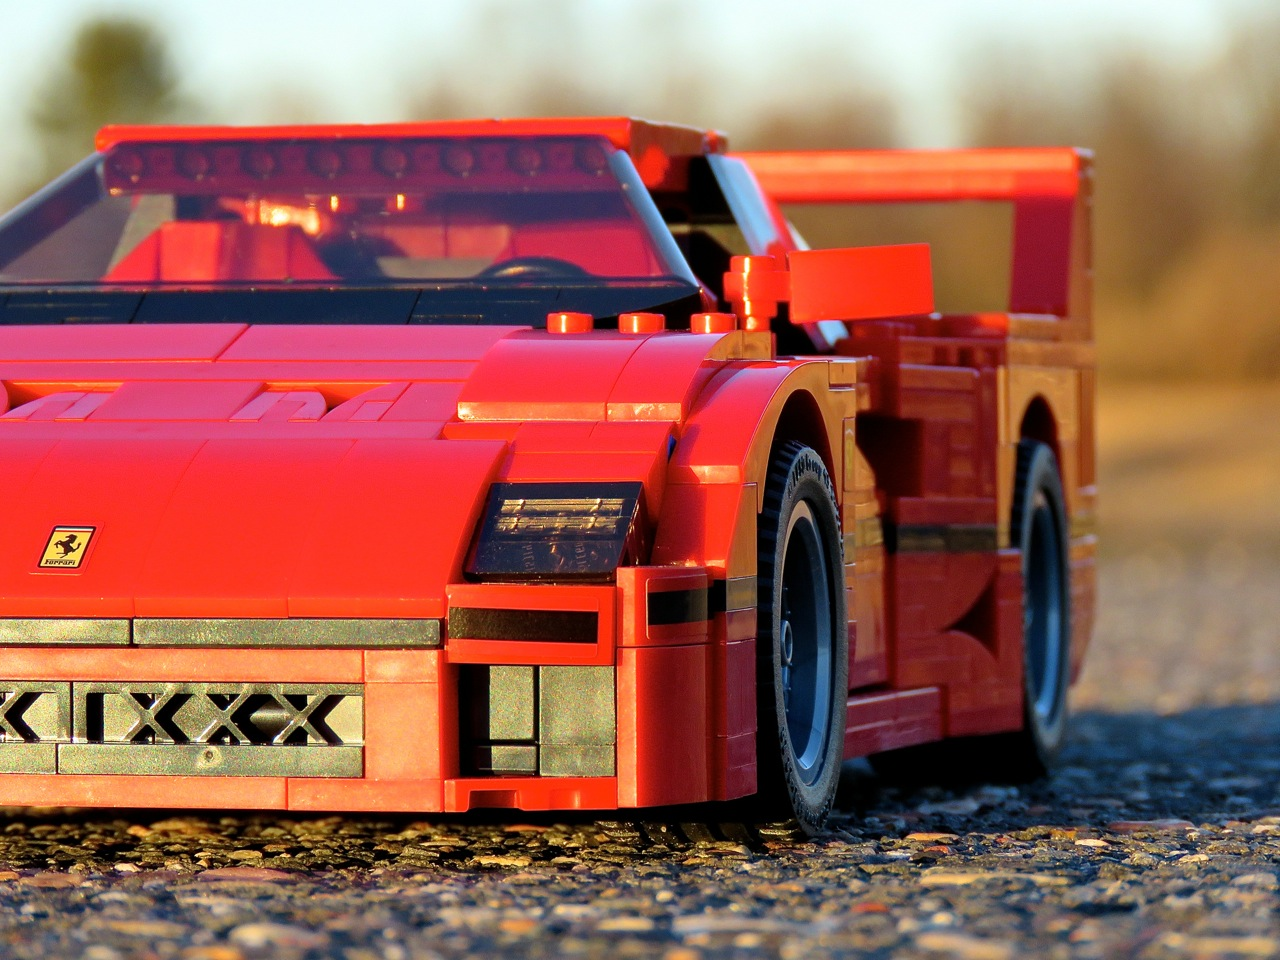 Lego Ferrari F40 8